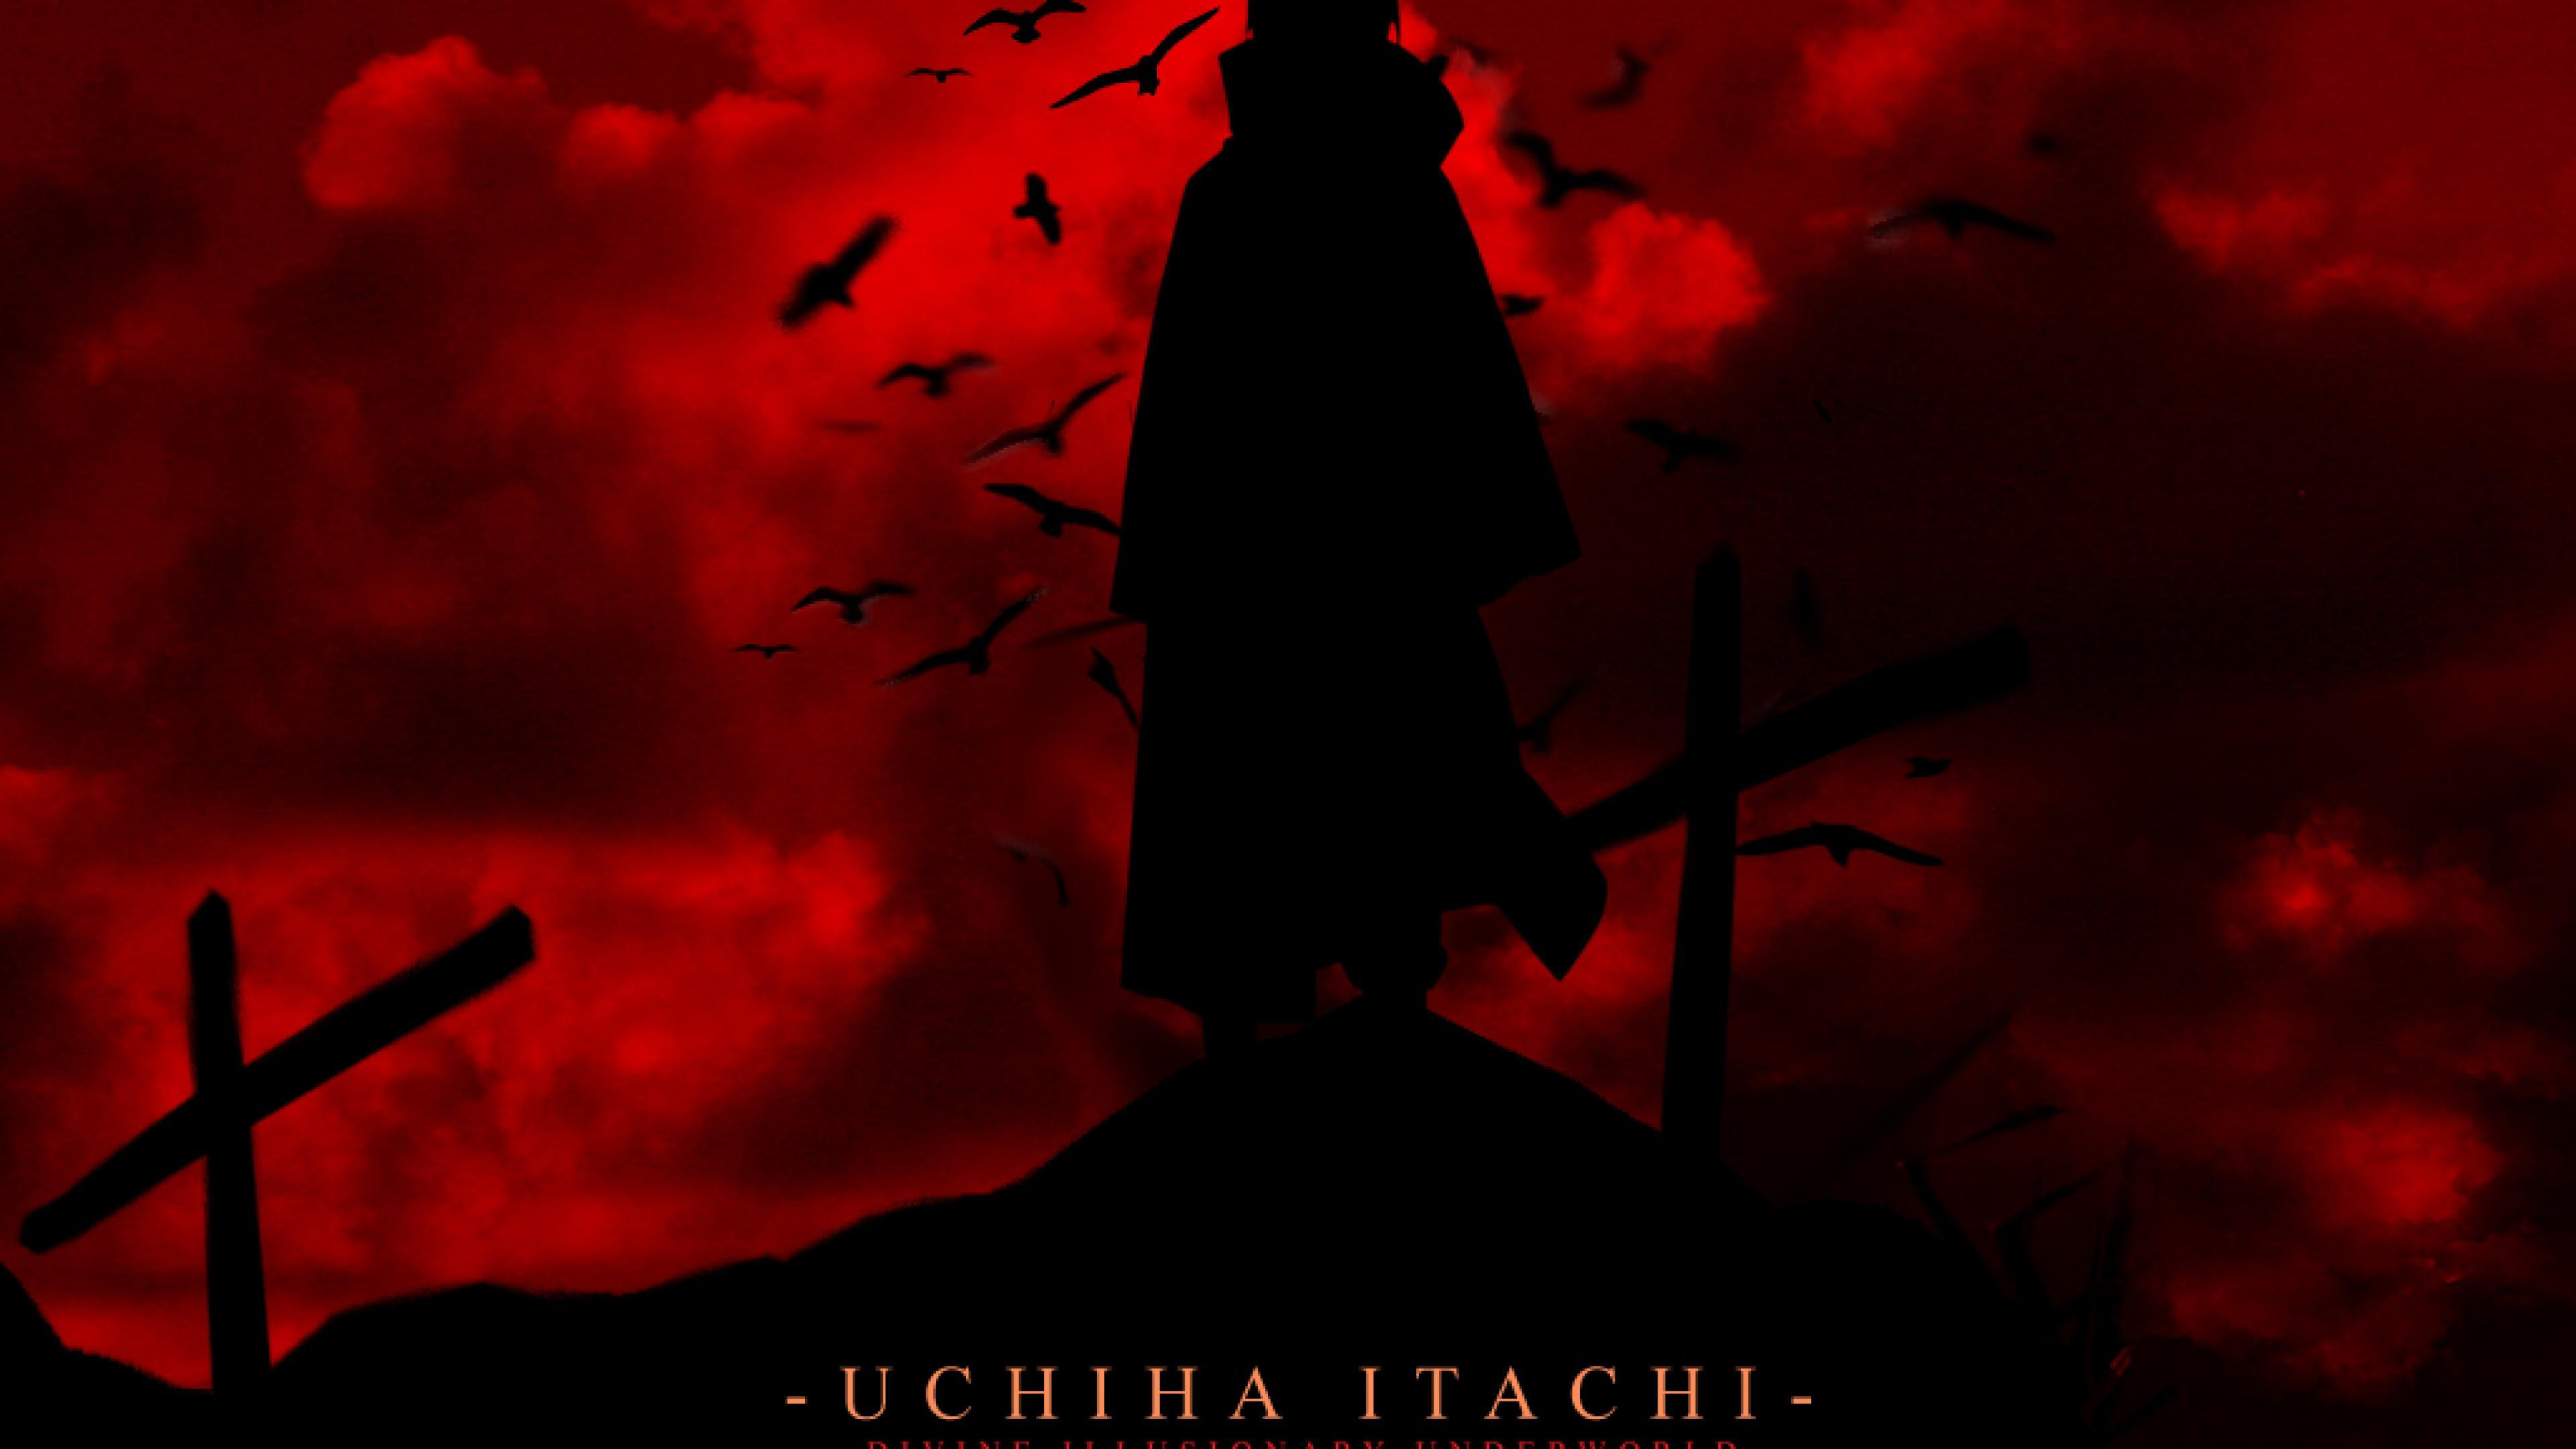 Itachi Uchiha Wallpapers High Quality Download Free